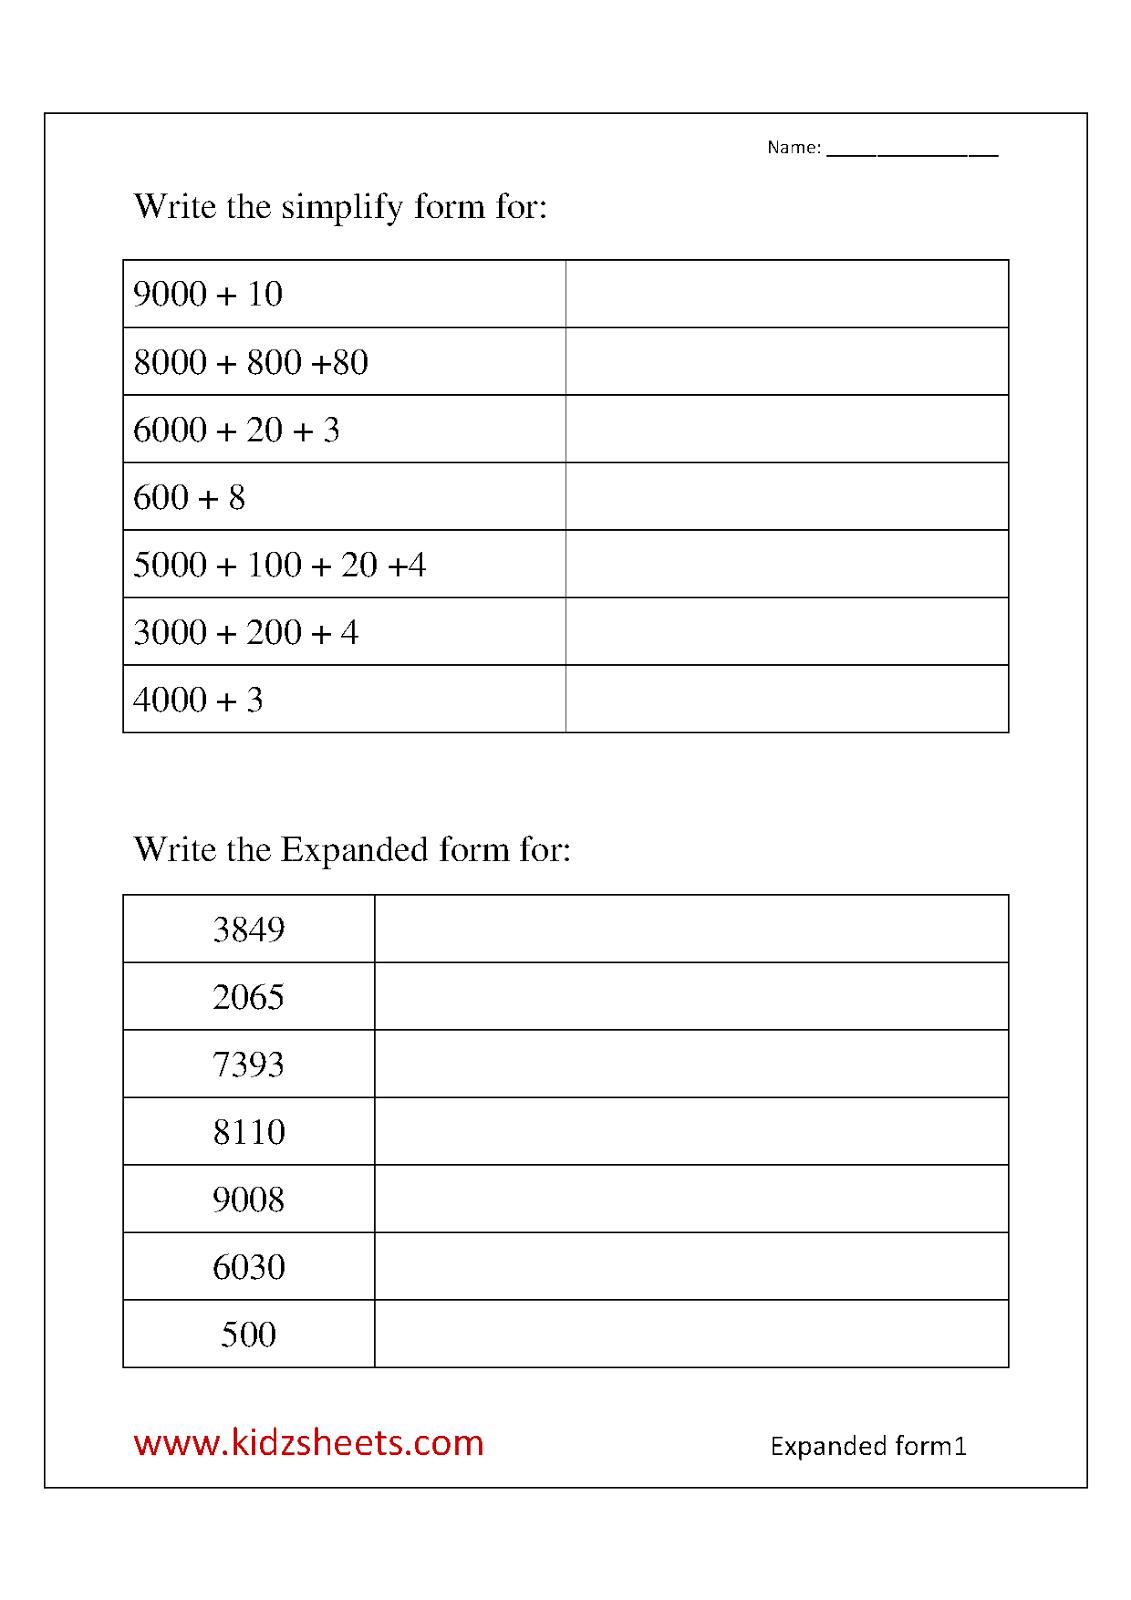 Expanded Form Worksheets For 3rd Grade